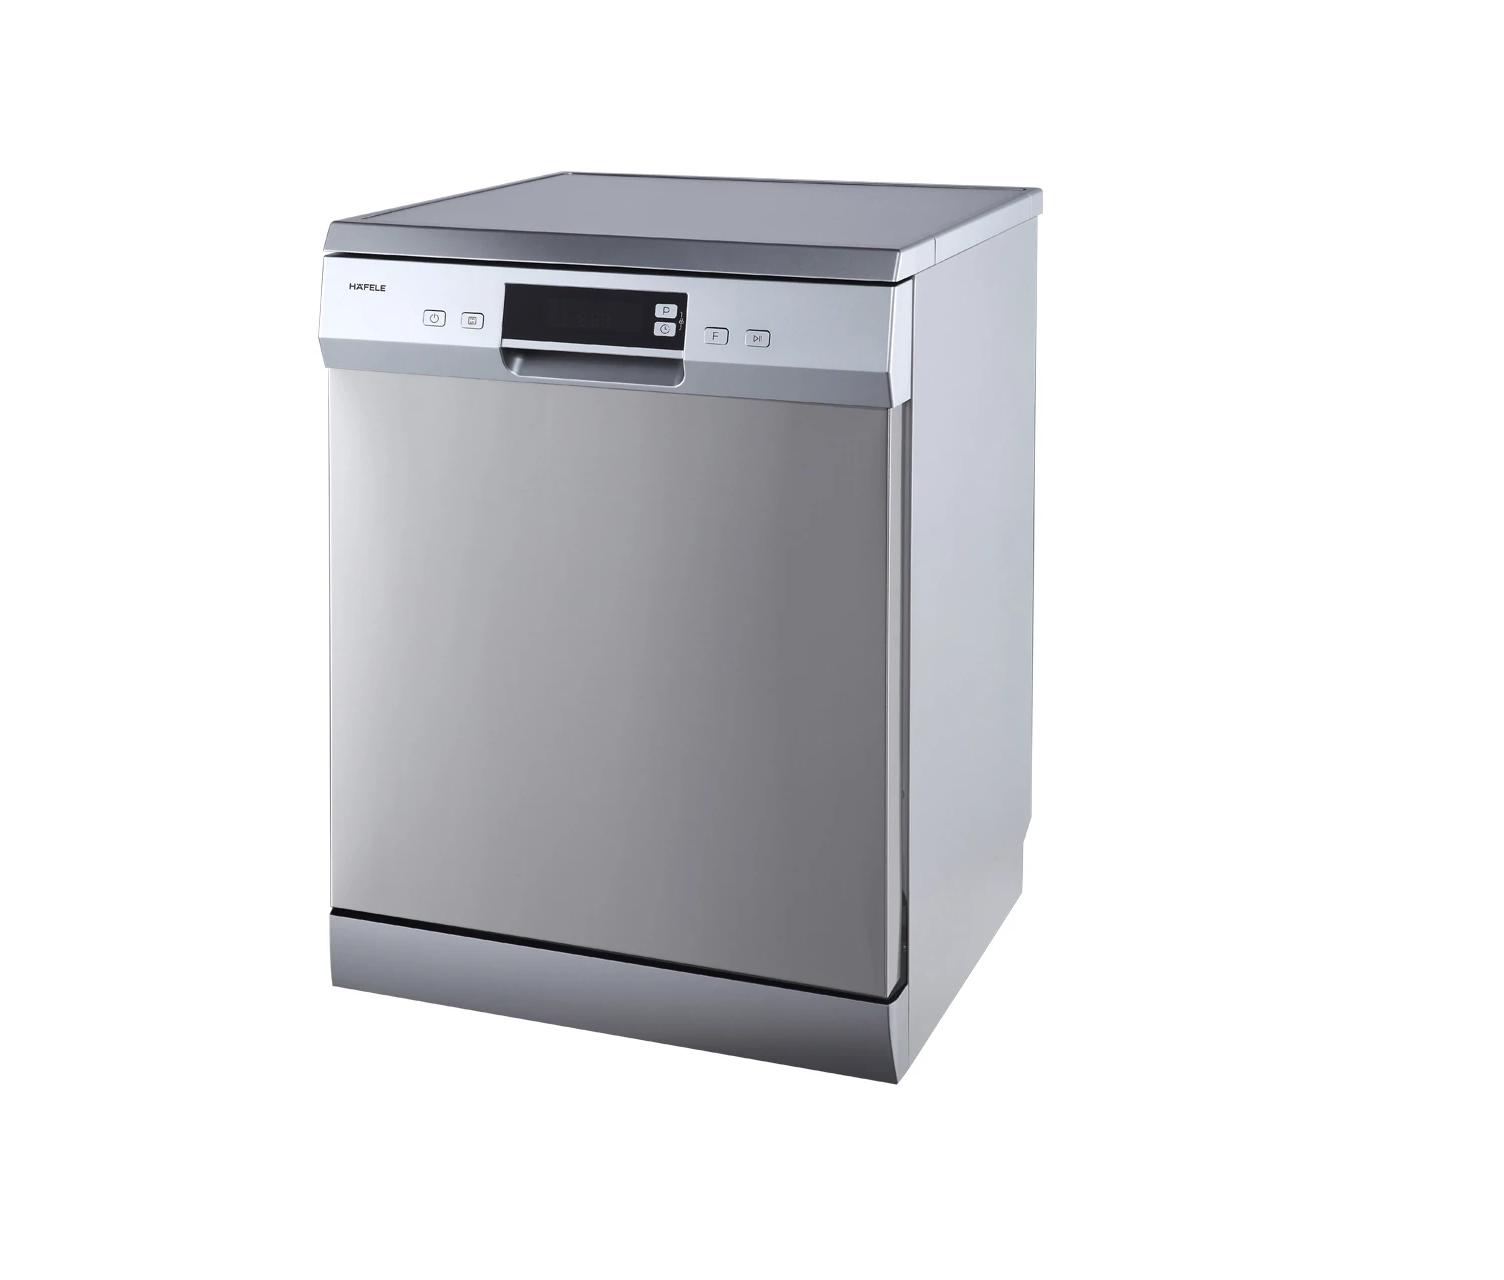 Máy rửa chén độc lập Hafele HDW-F60E 538.21.200